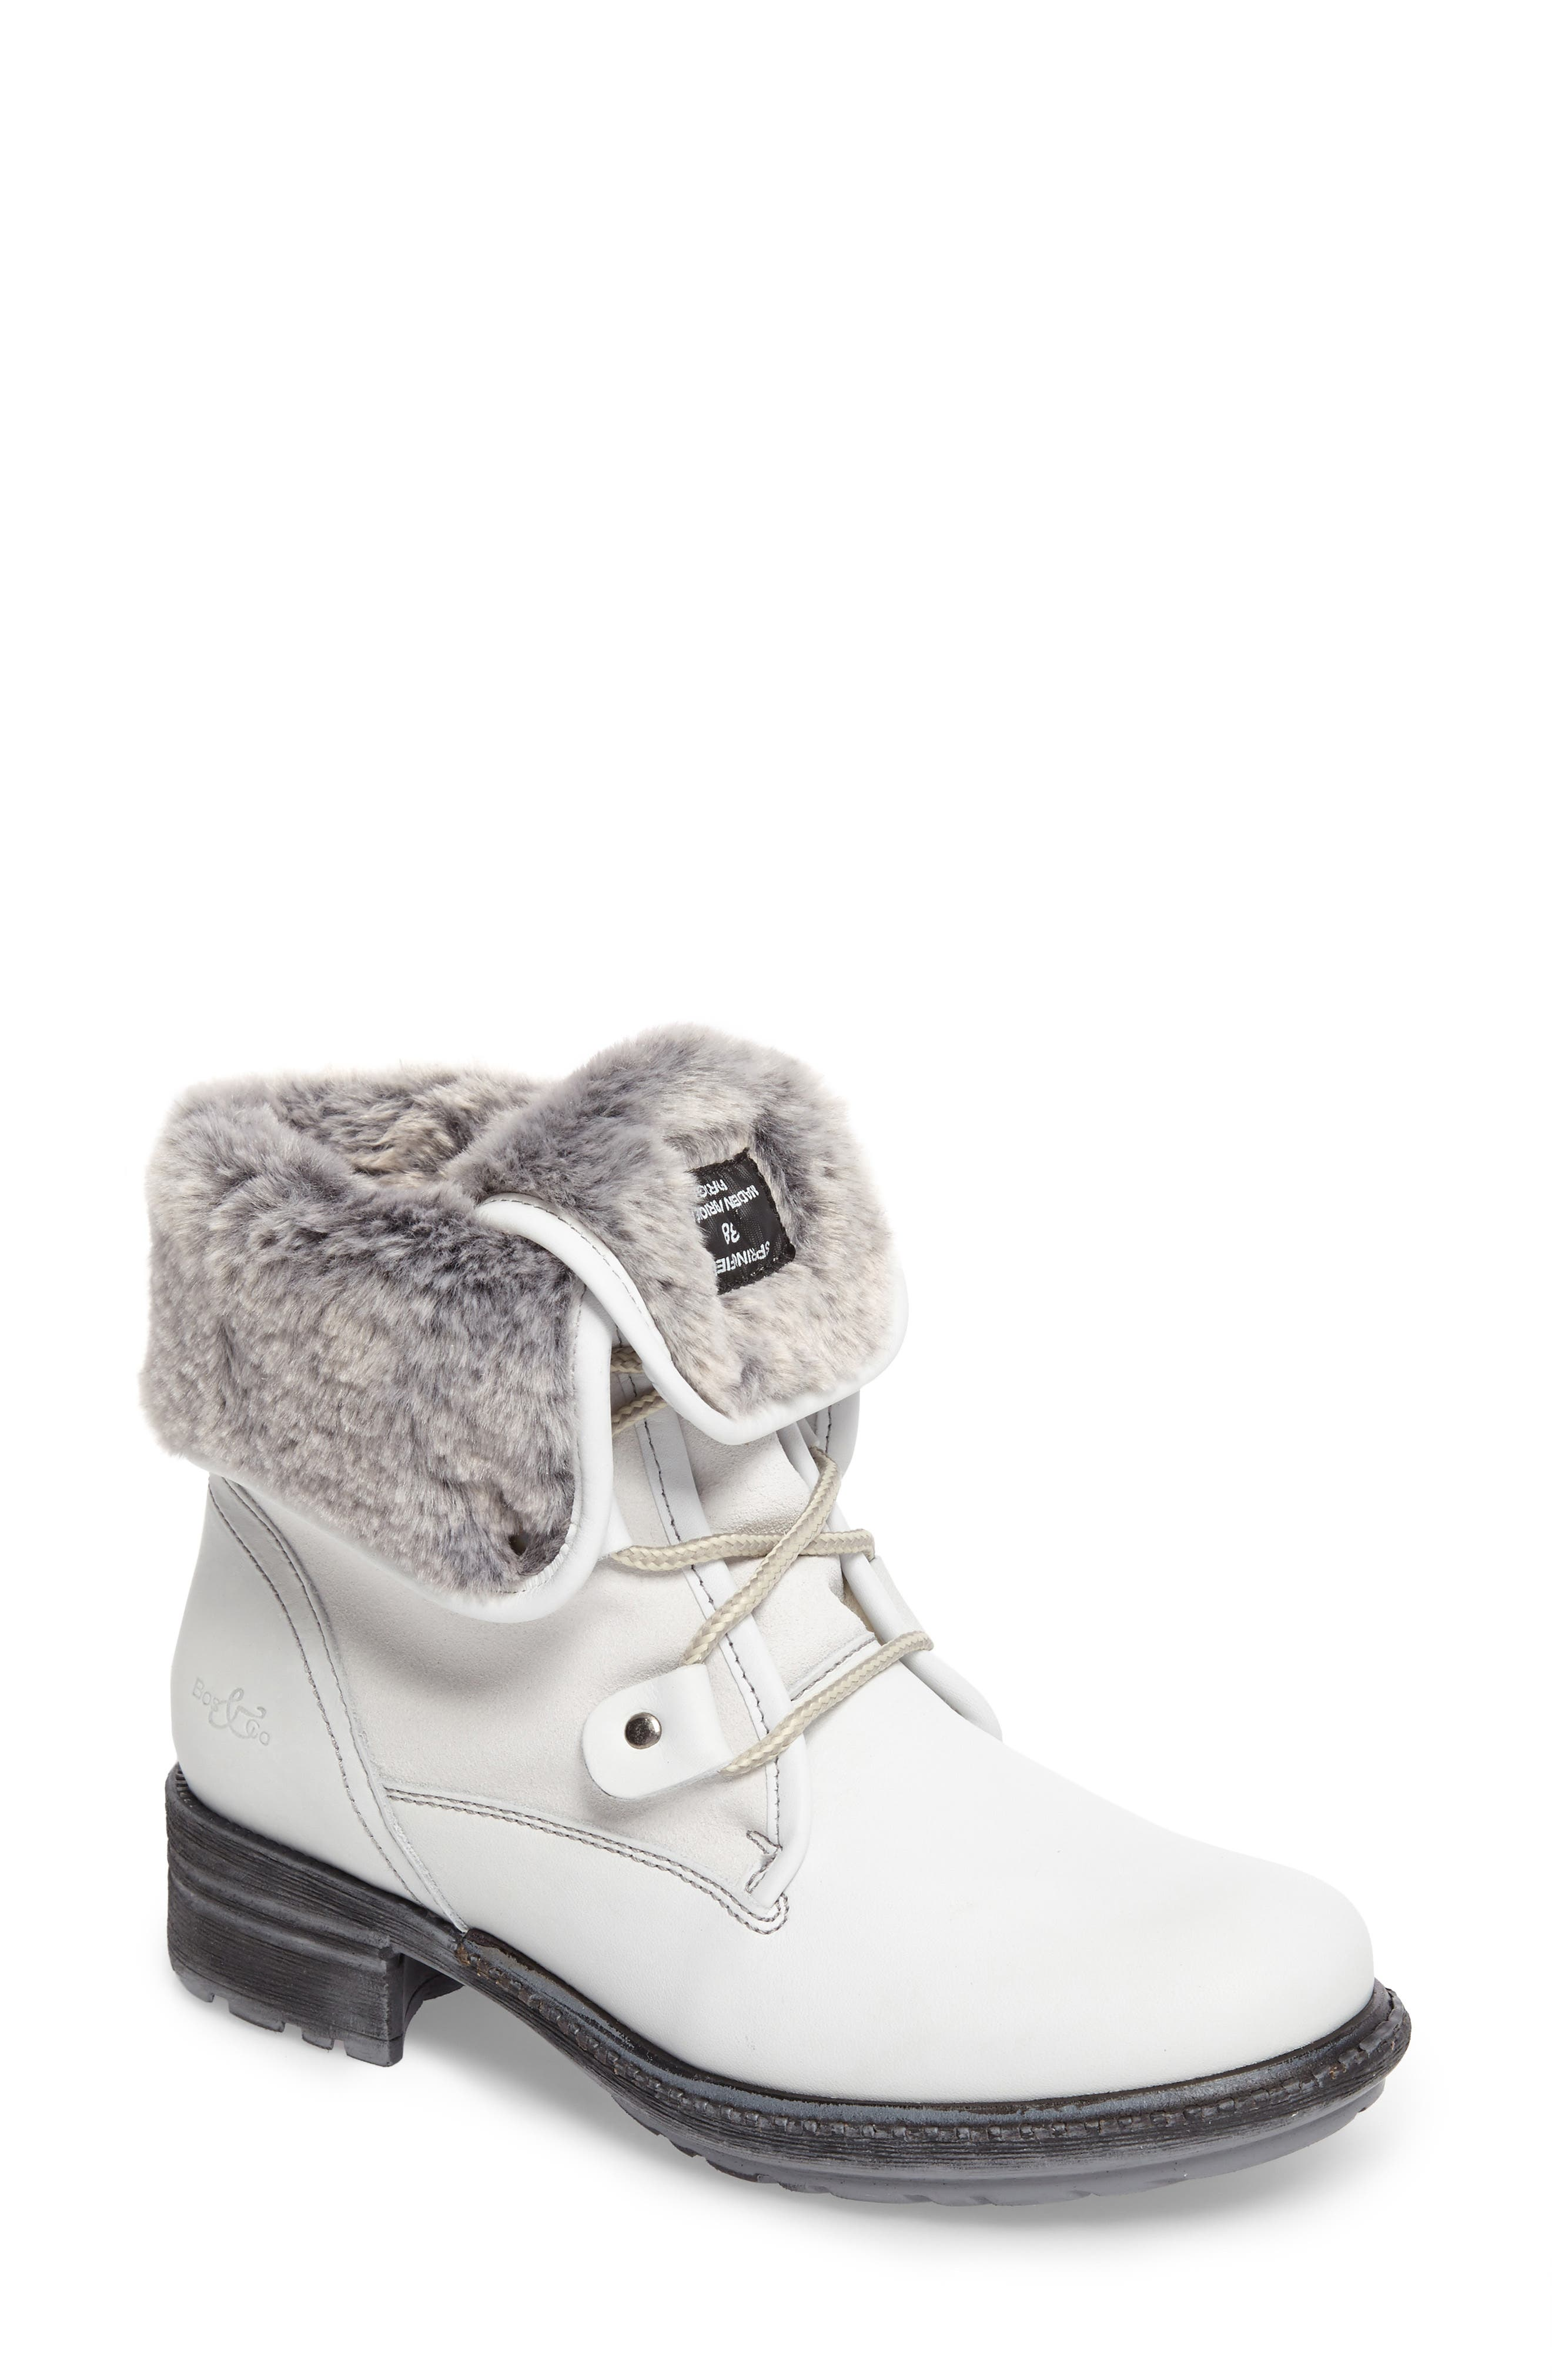 Springfield Waterproof Winter Boot,                         Main,                         color, White/ Grey/ Black